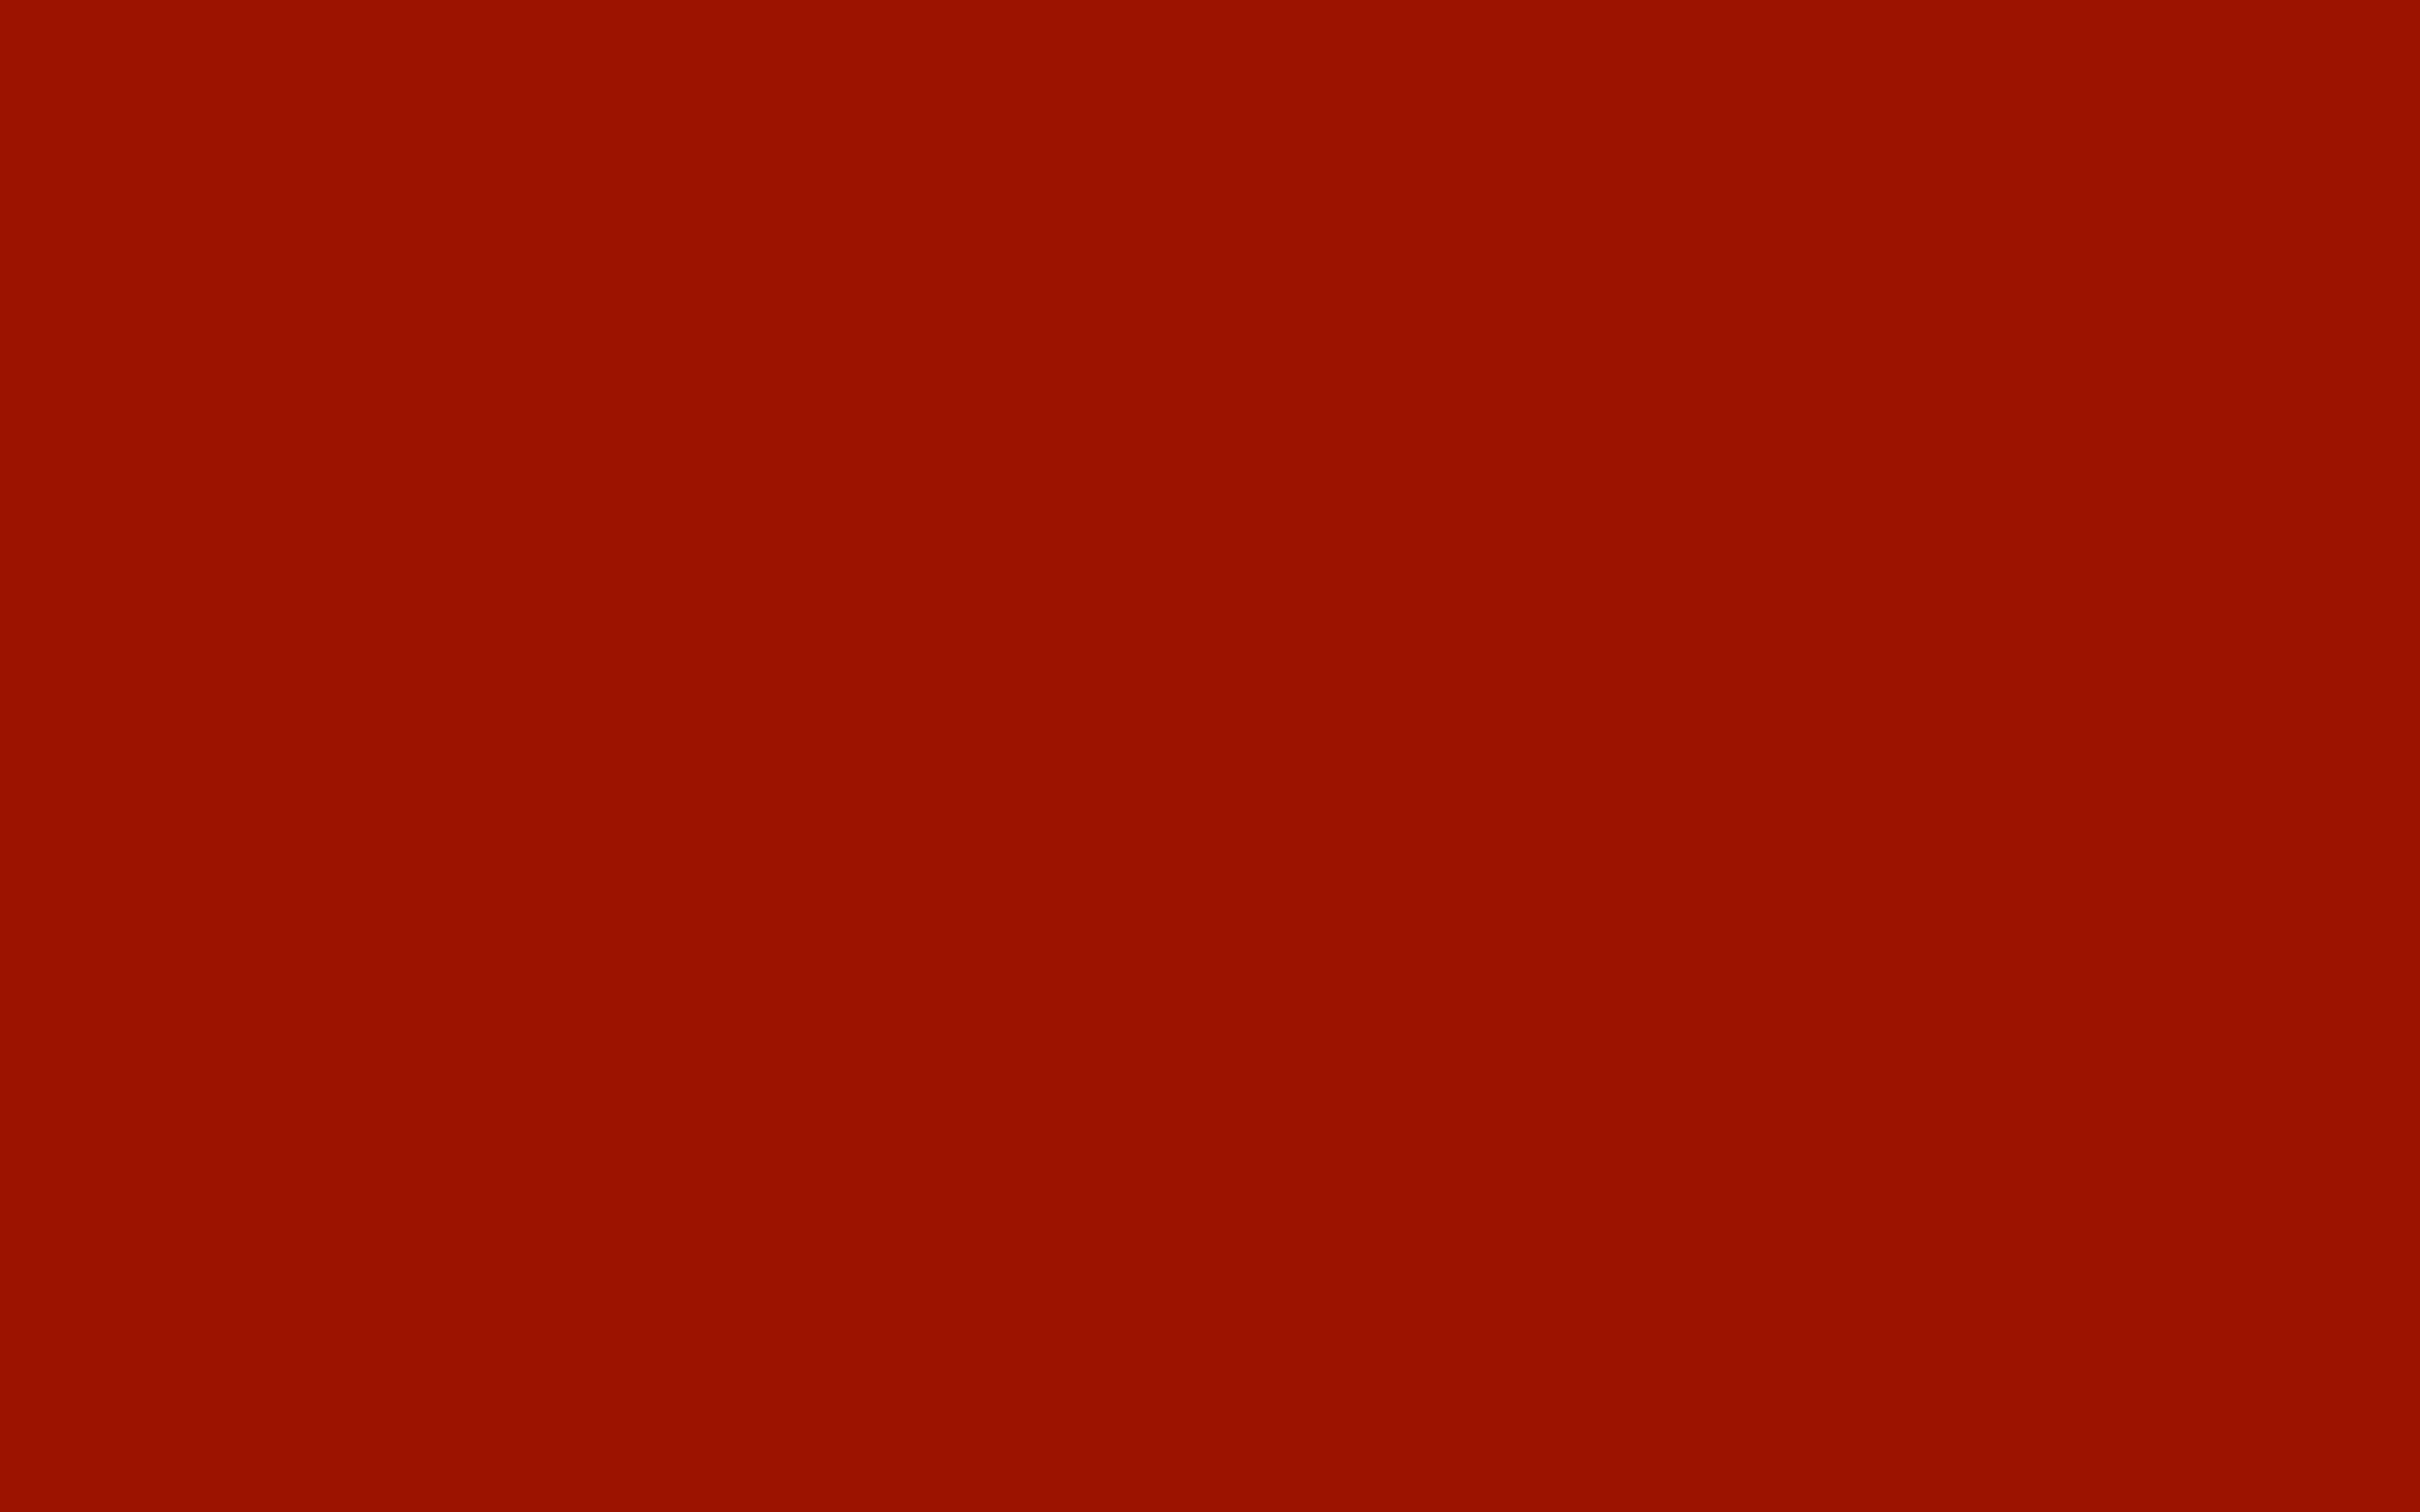 Red Colour Wallpaper Hd Color